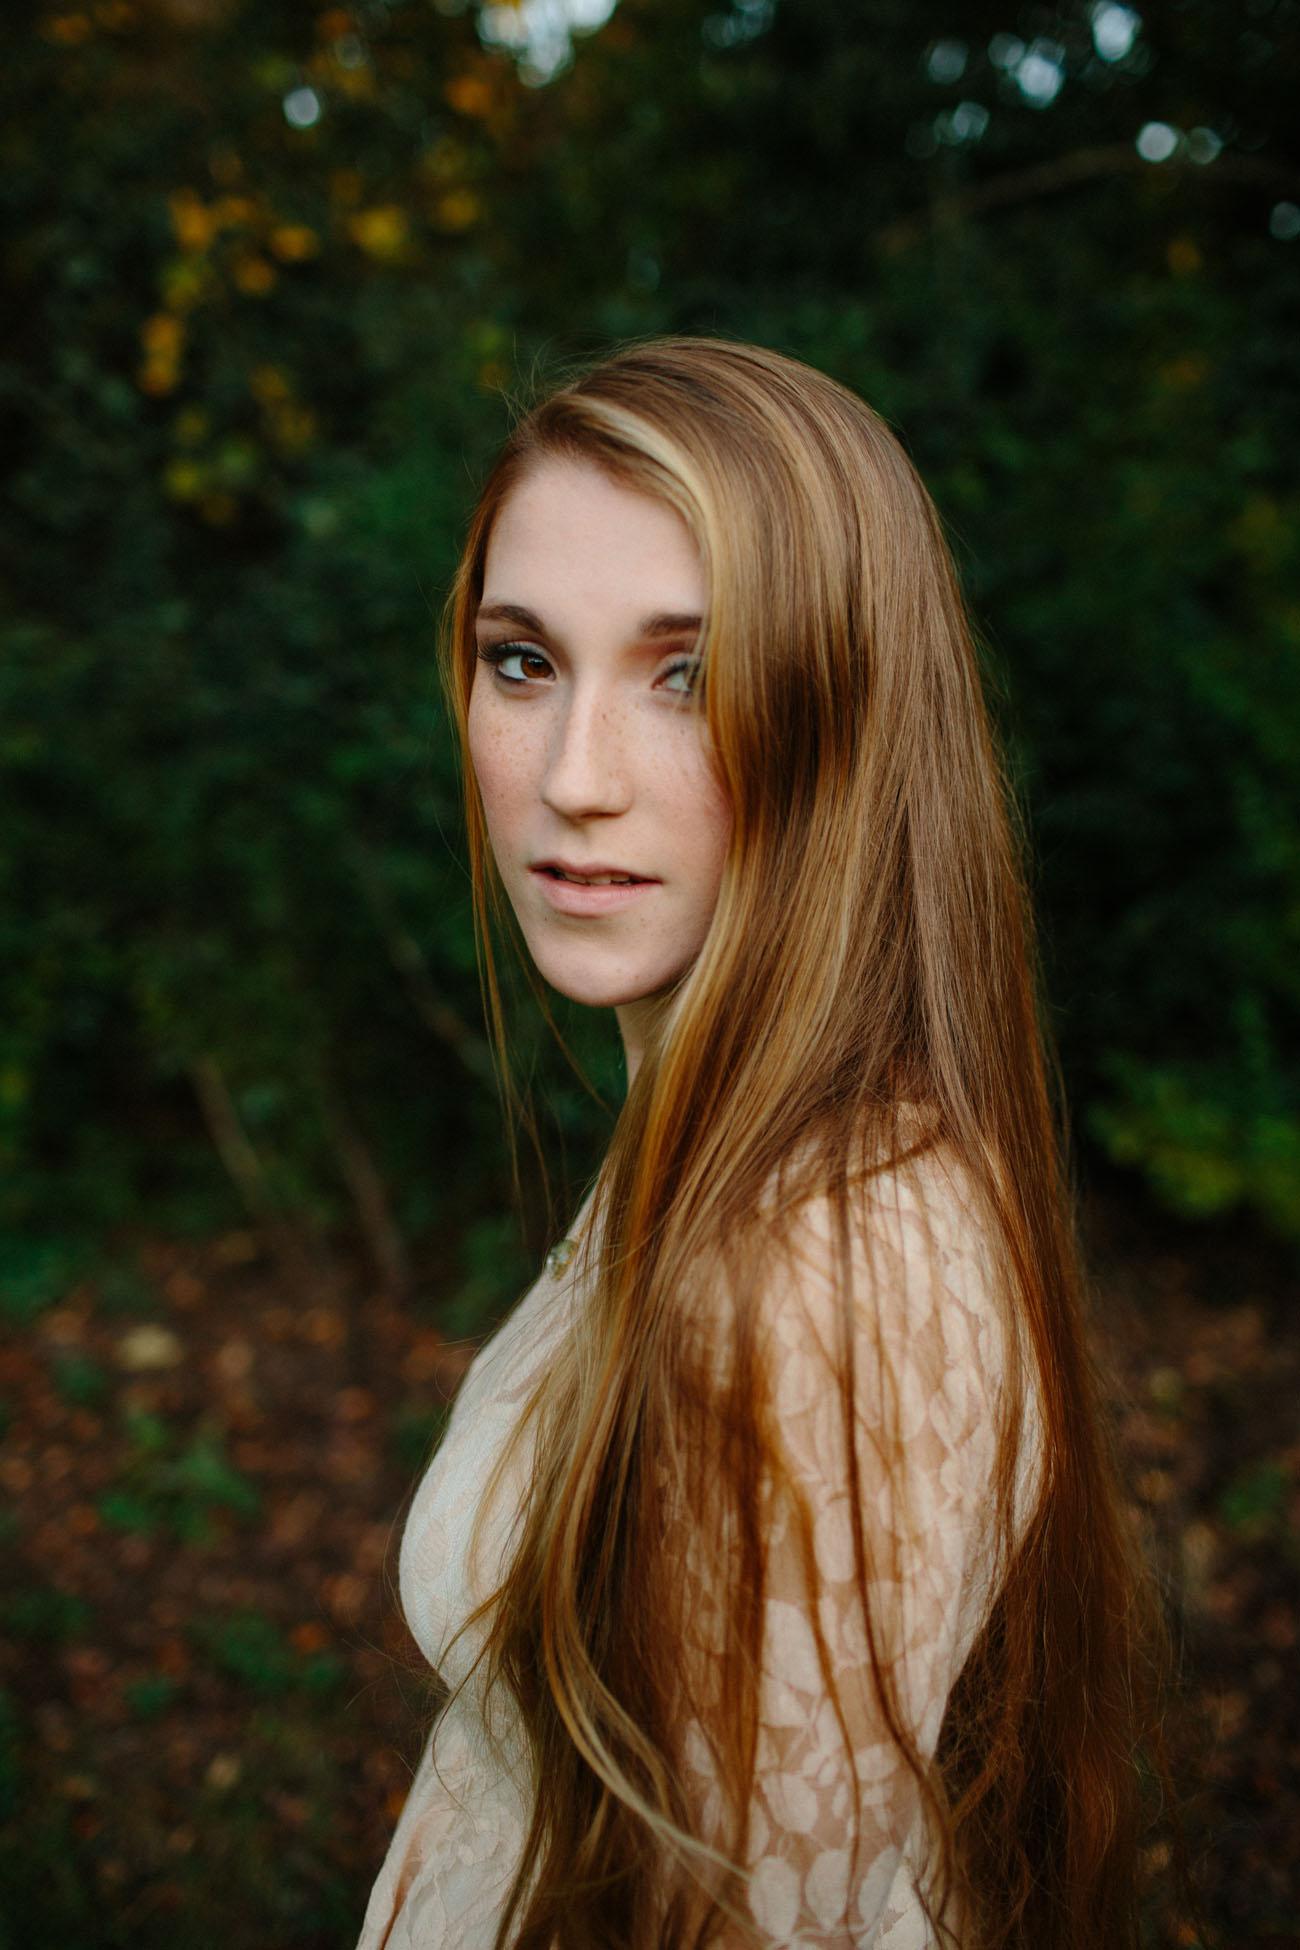 Olivia-Featured-Shoot_01.jpg